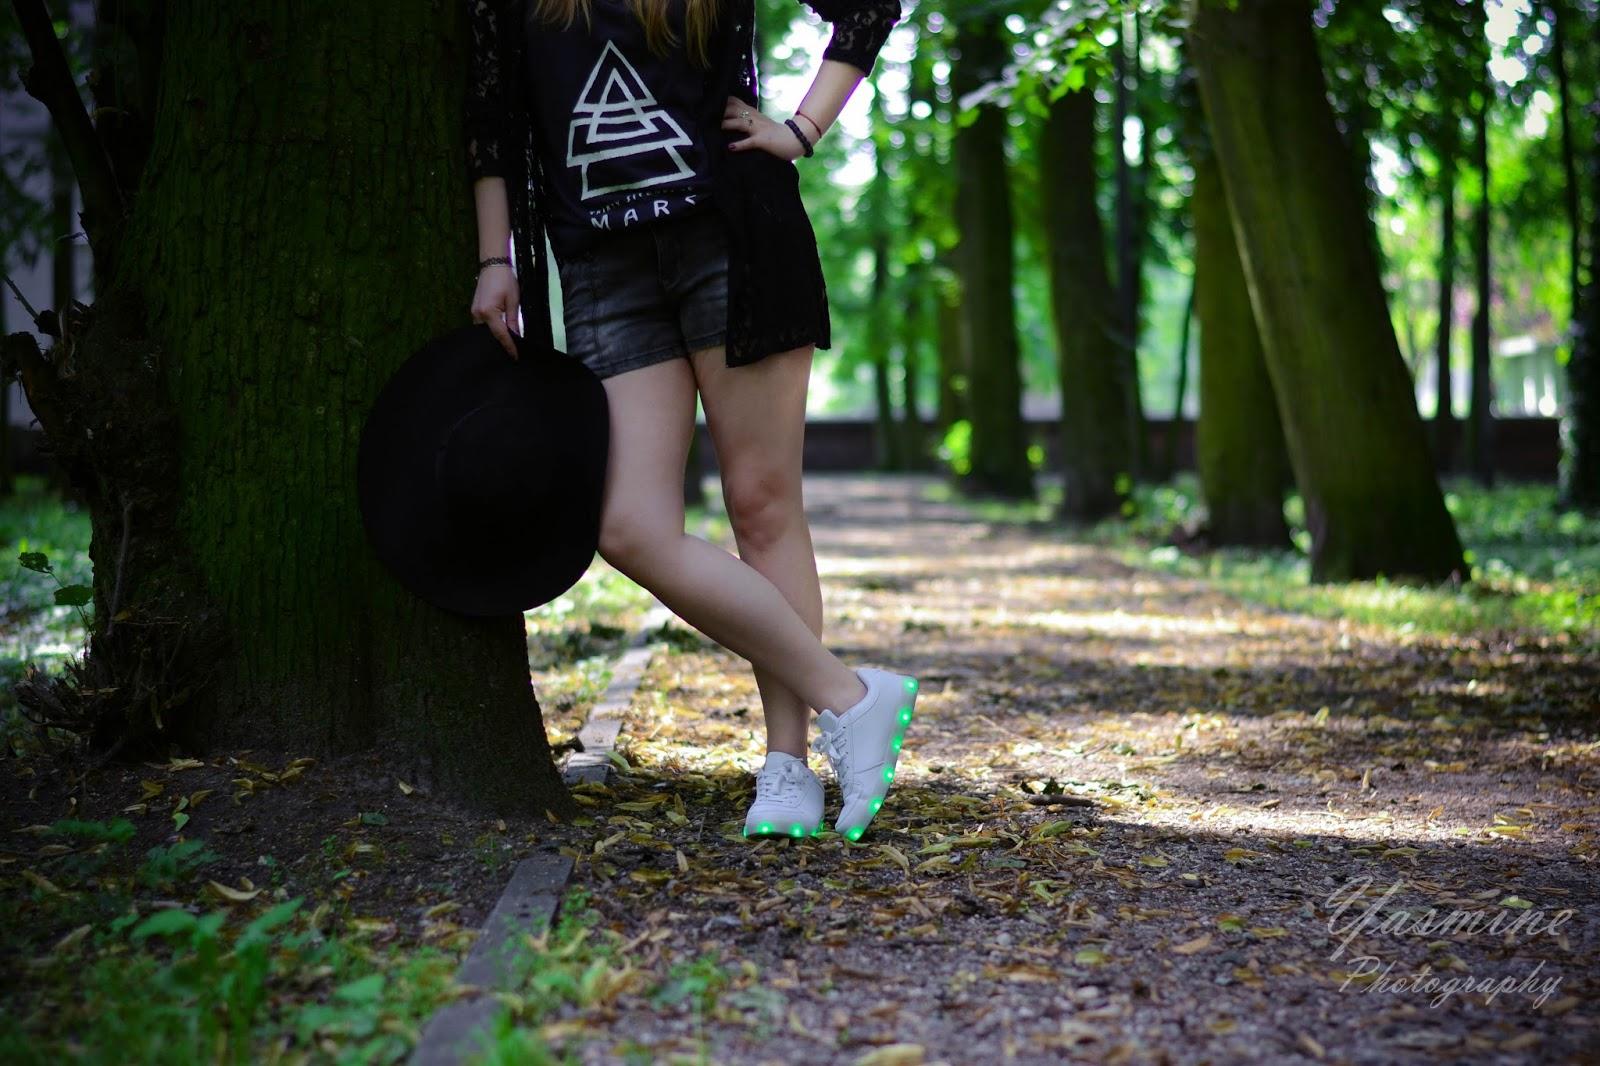 renee shoes lato z renee white sneakers disco lights biale buty z diodami led. inspiration